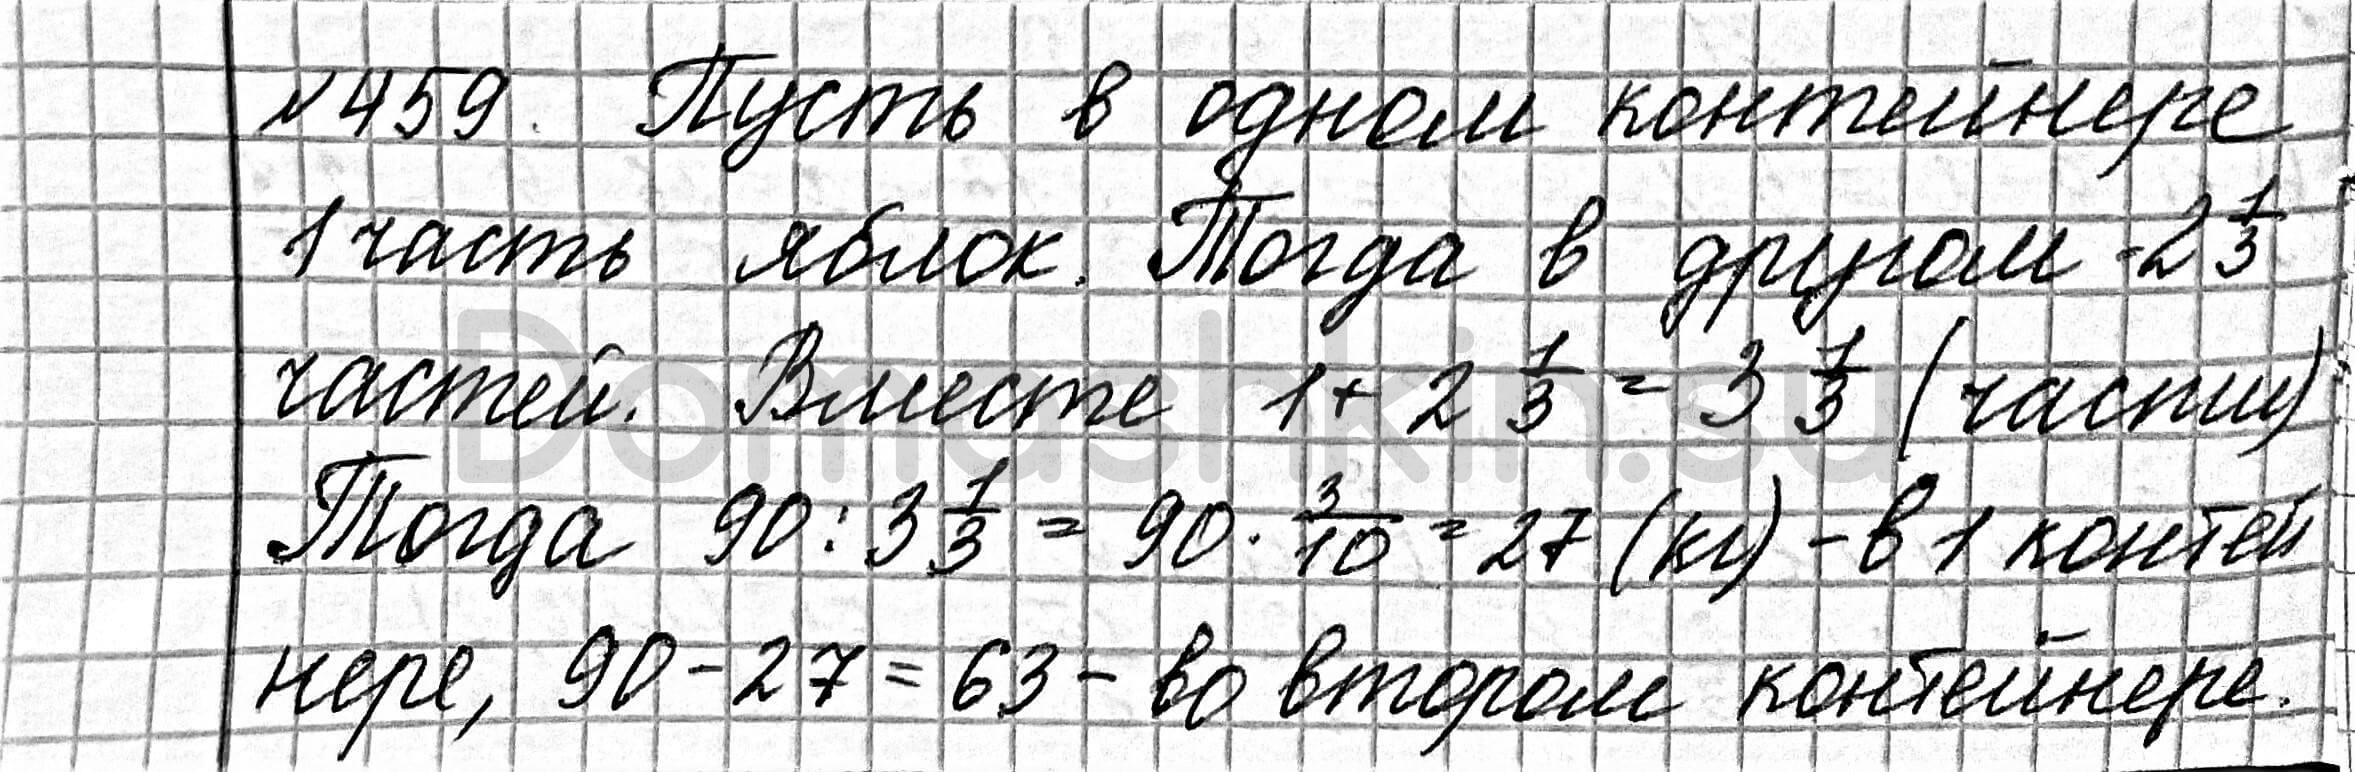 Математика 6 класс учебник Мерзляк номер 459 решение